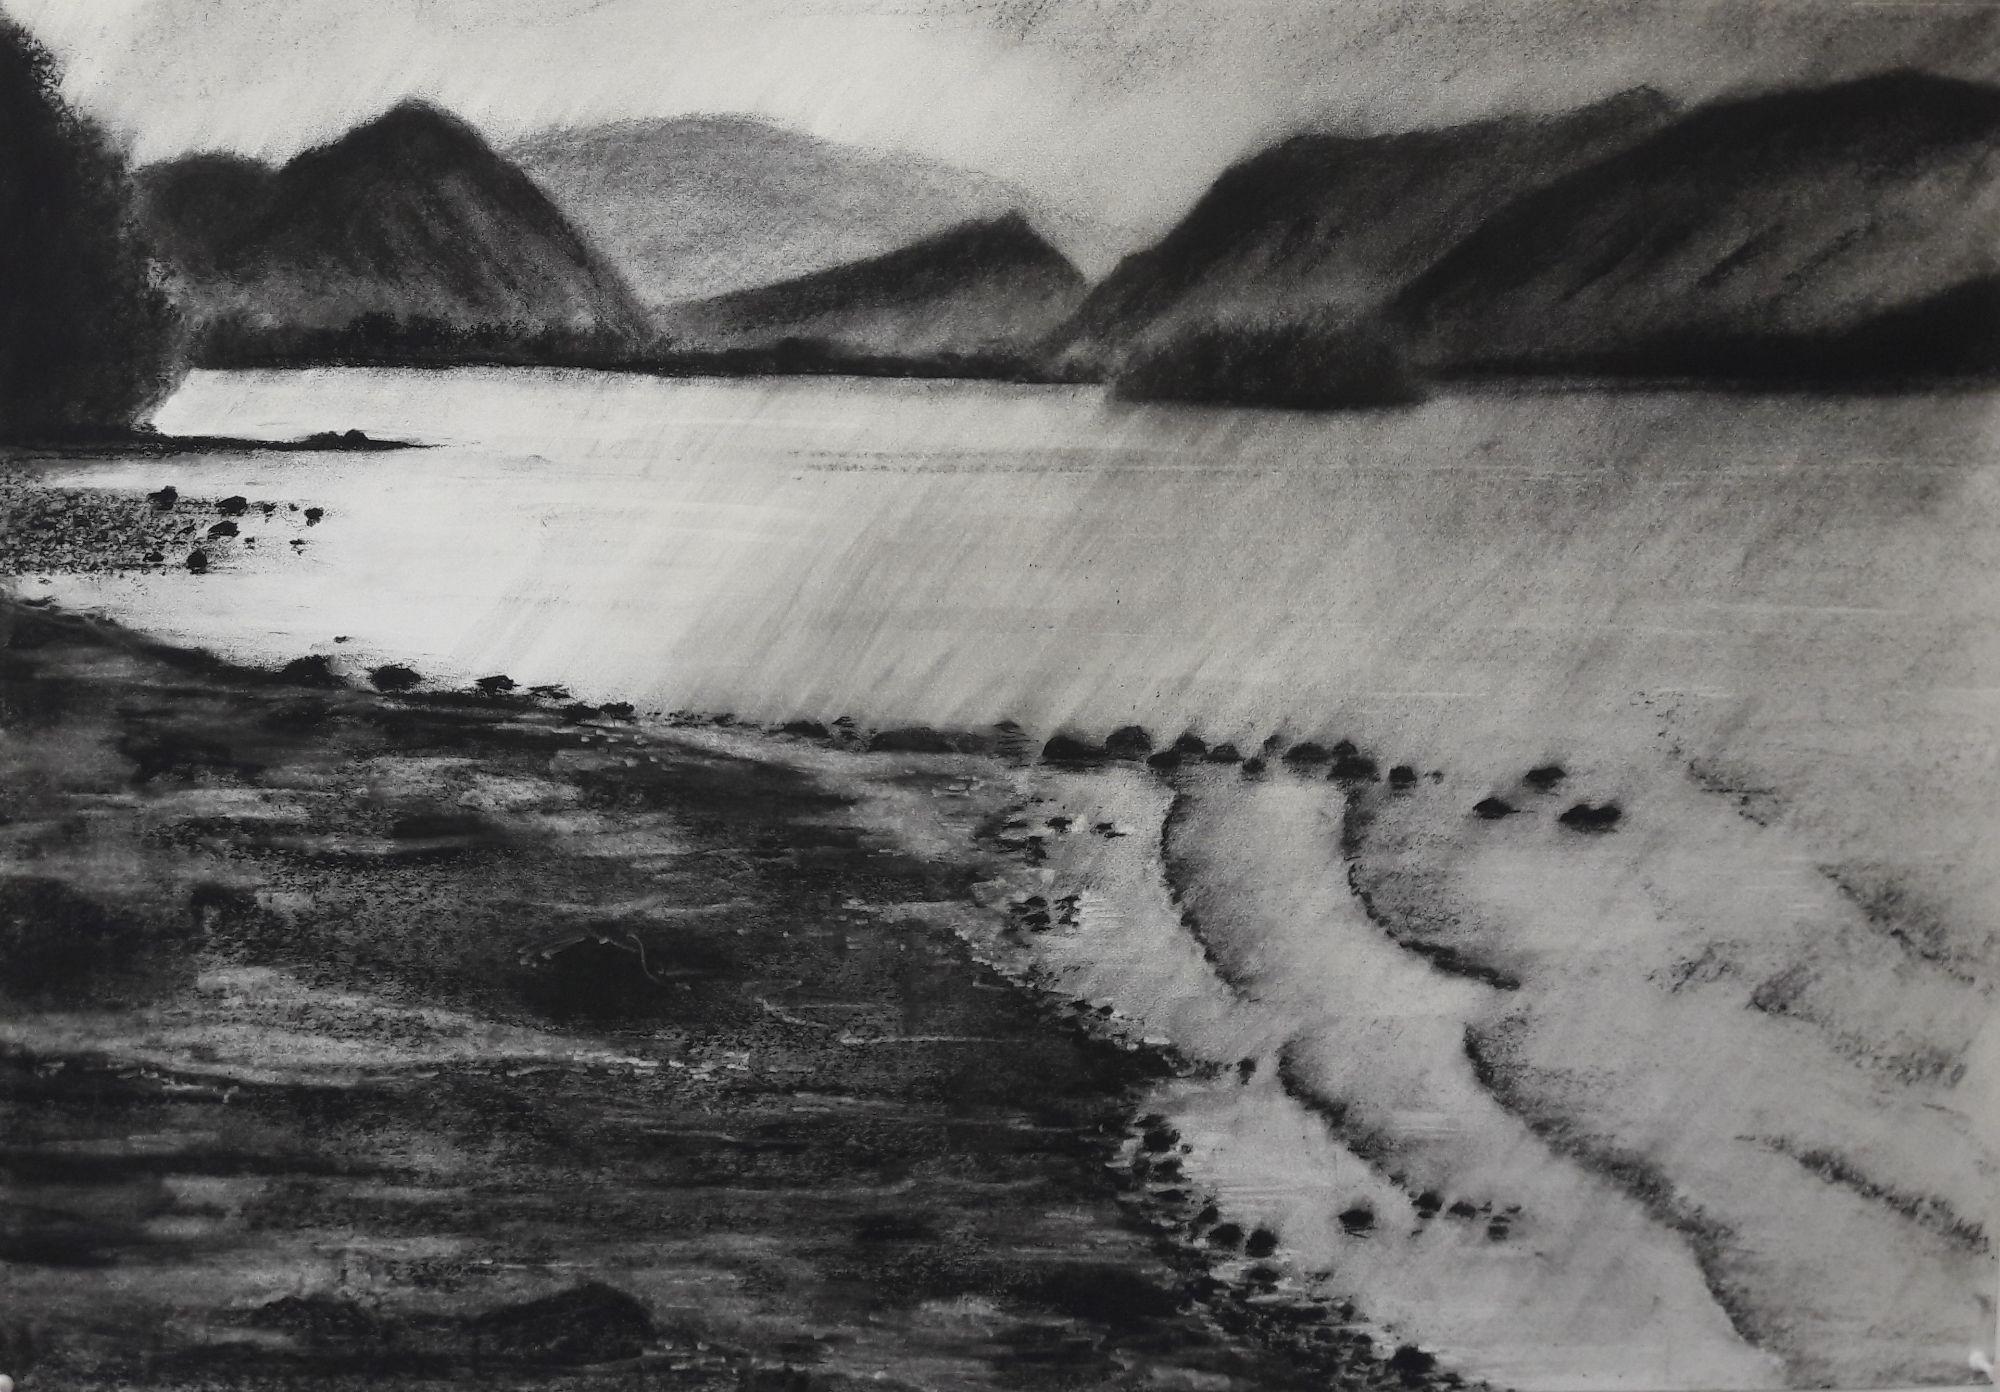 Derwentwater #1 - Charcoal on Surrey cartridge paper (594 x 841 mm)